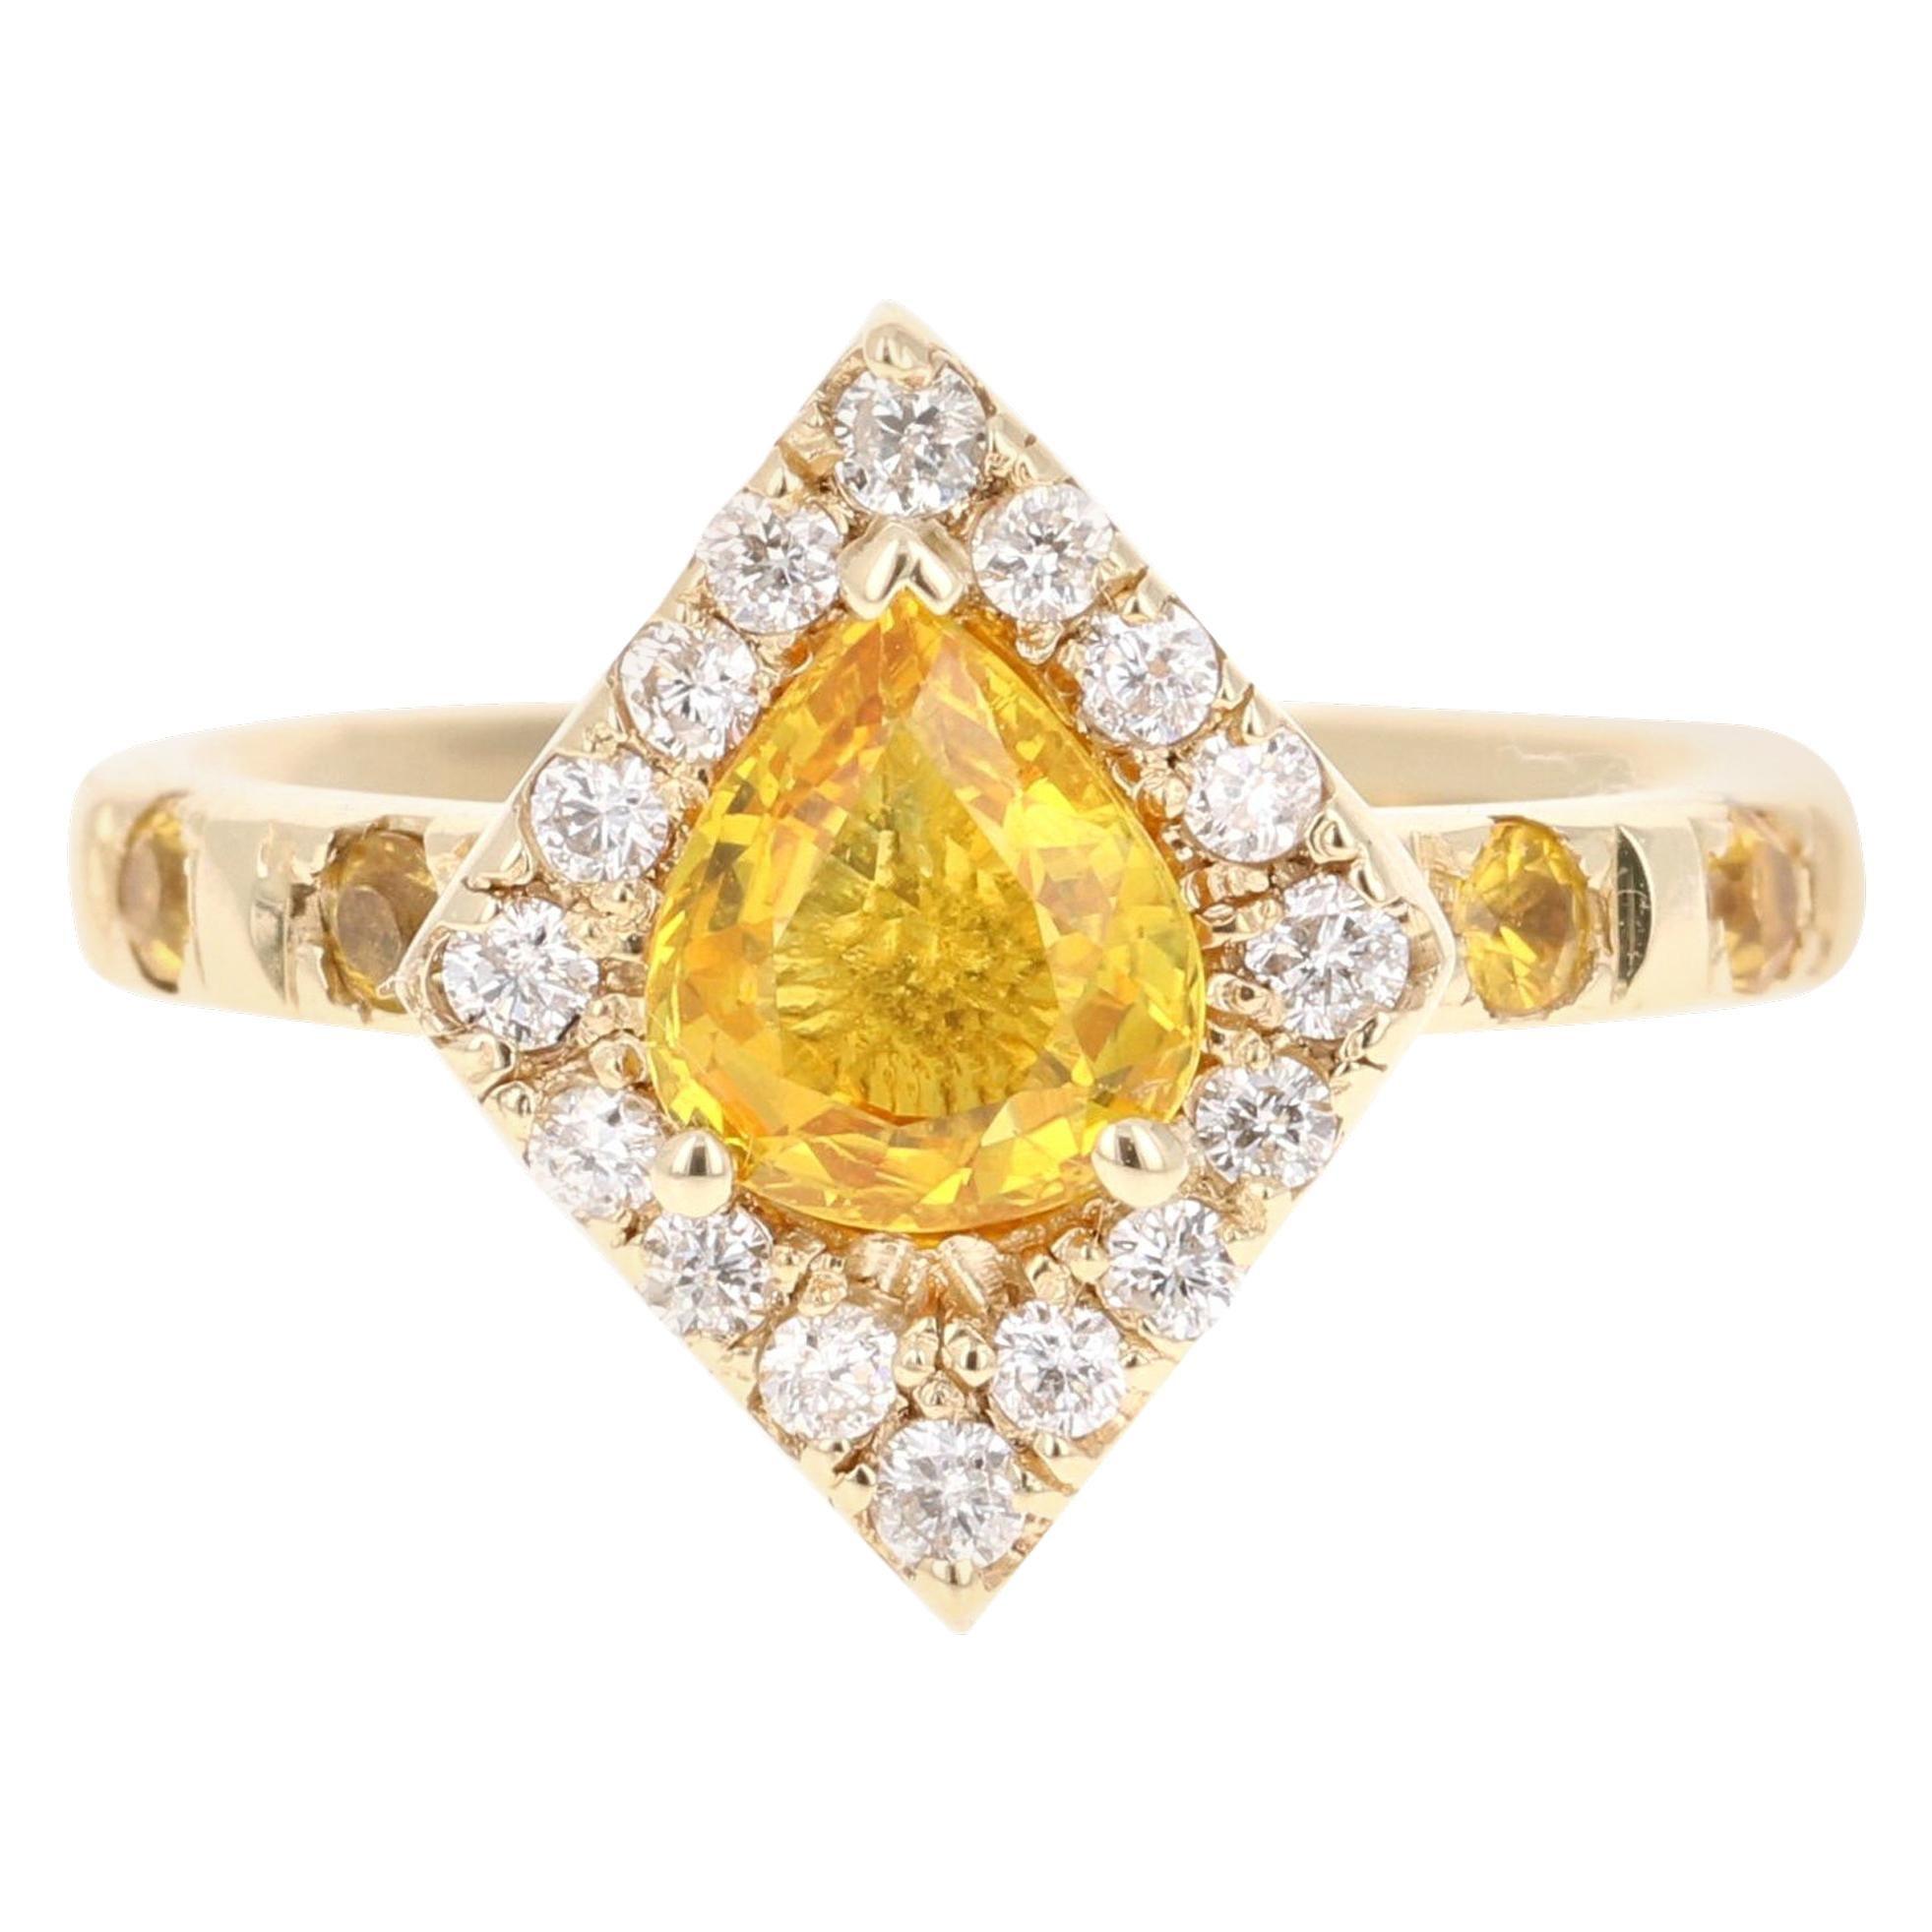 2.01 Carat Yellow Sapphire and Diamond 14 Karat Yellow Gold Ring